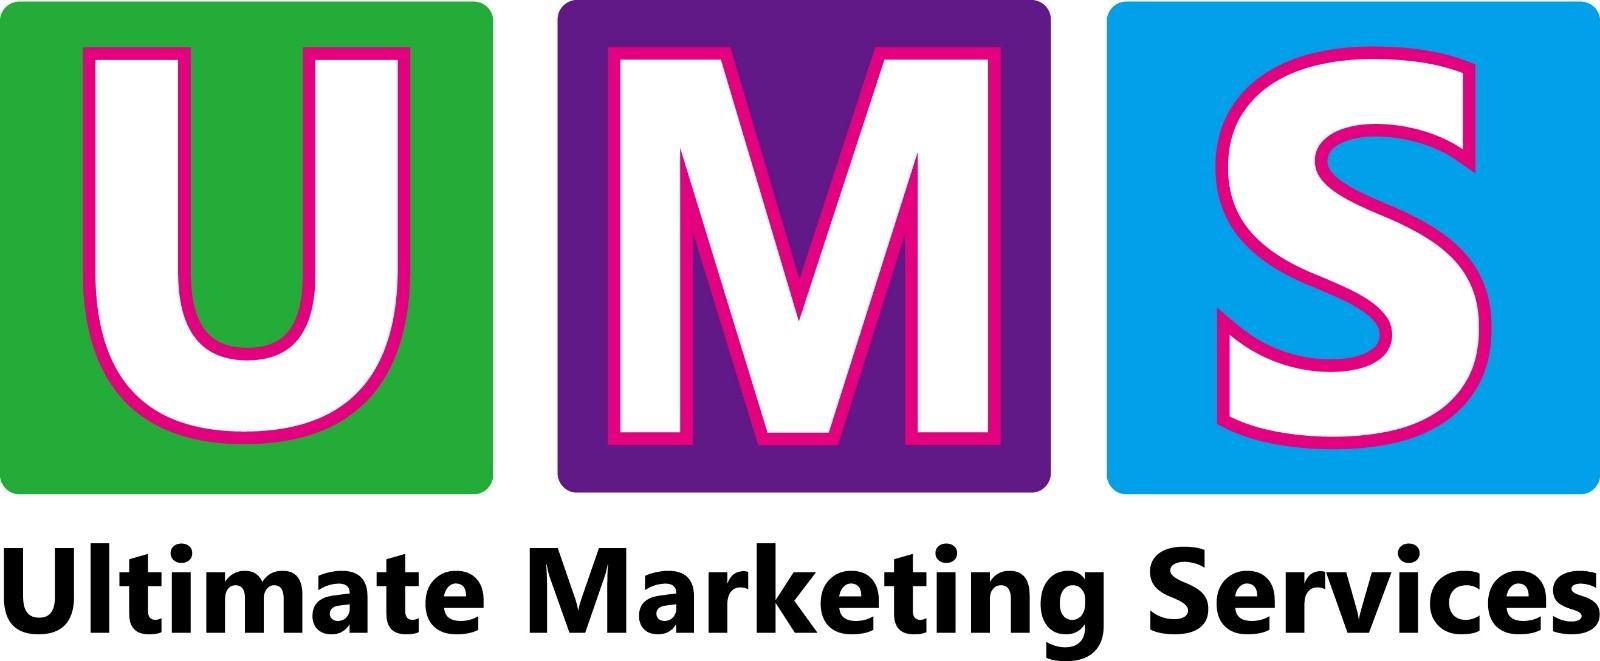 Ultimate Marketing Services Ltd. Logo